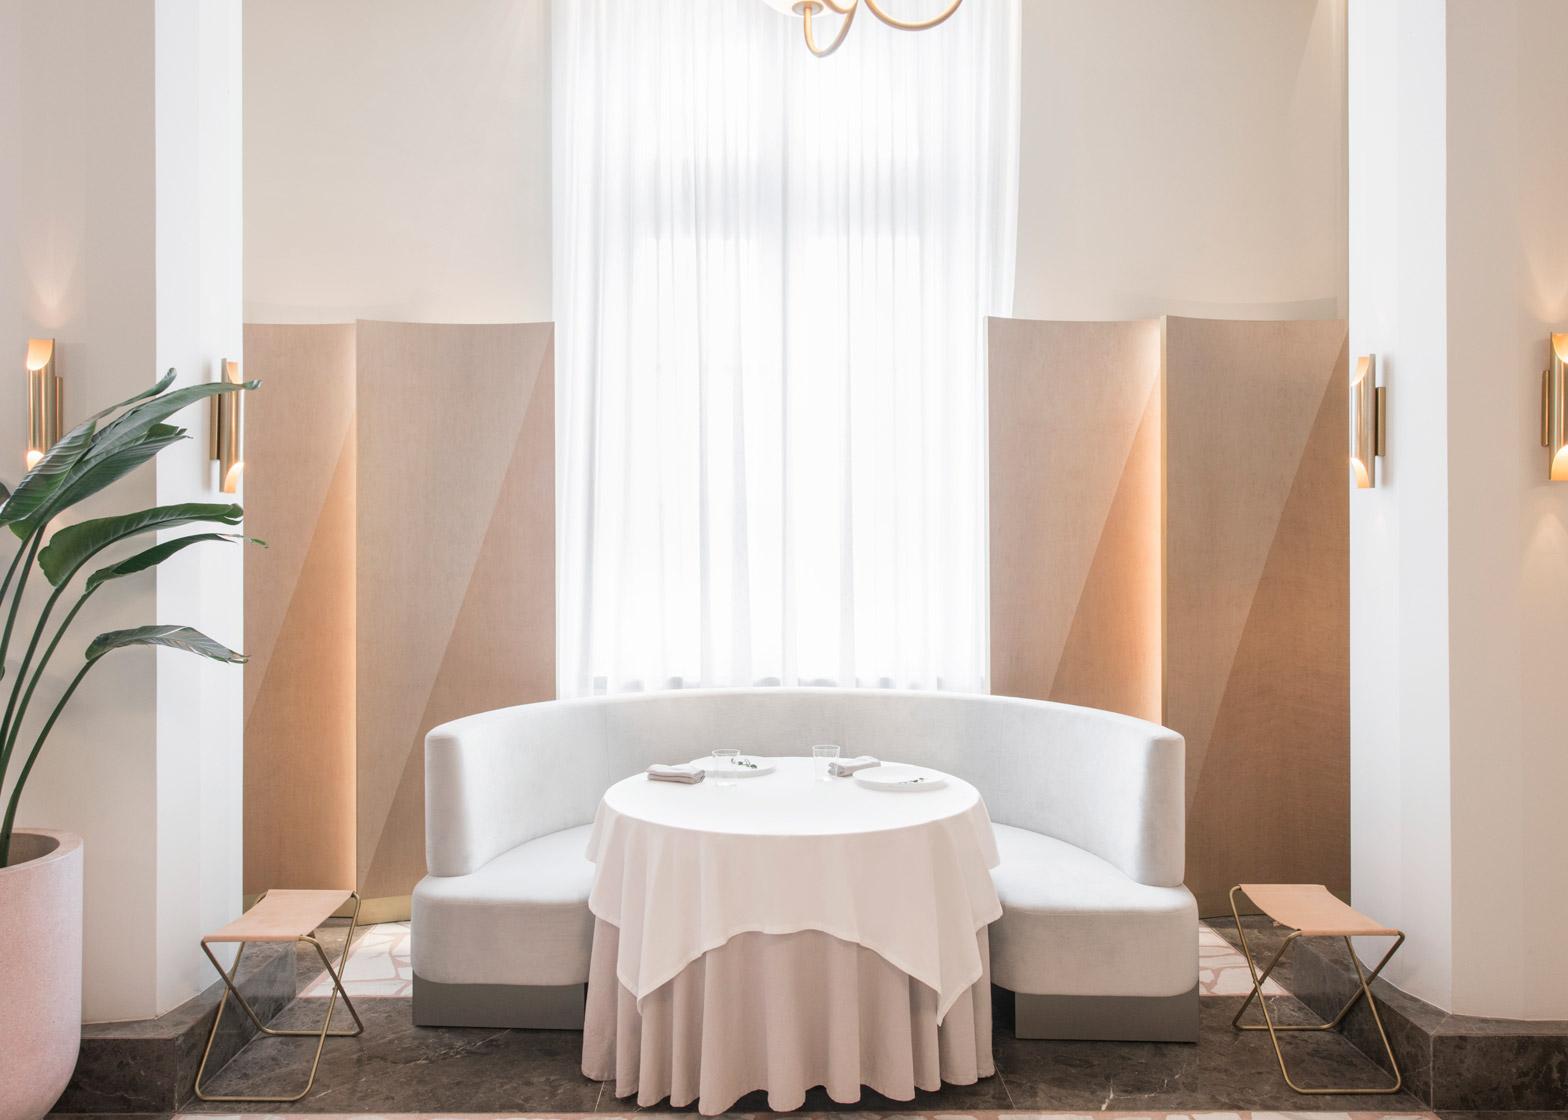 odette-universal-design-studio-singapore-restaurant-design-6